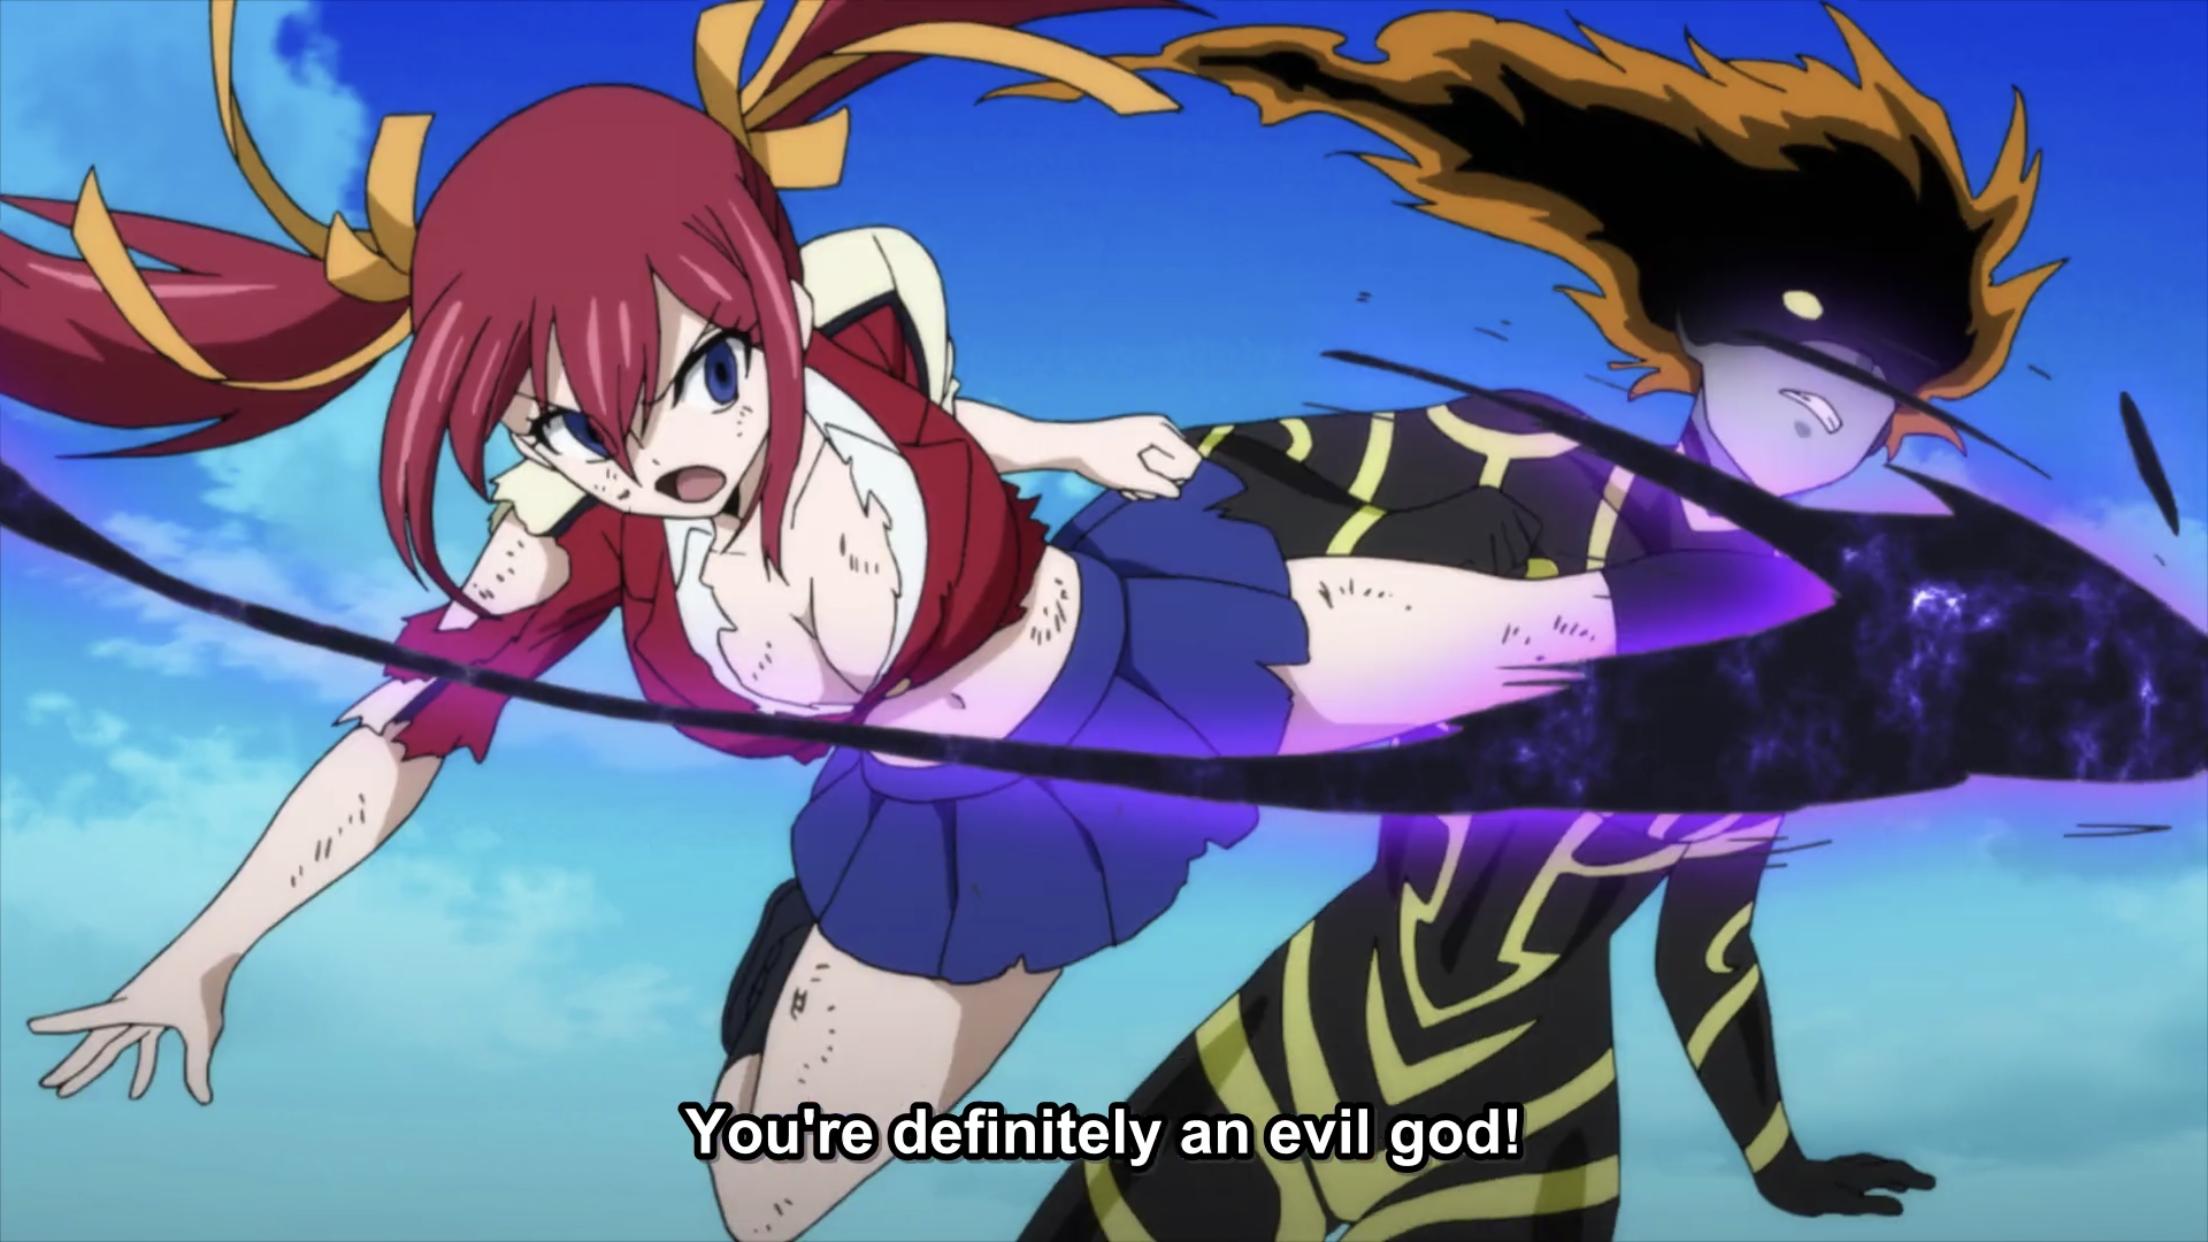 Fairy Tail 2018 Episode 22 Fairy tail anime, Fairy tail